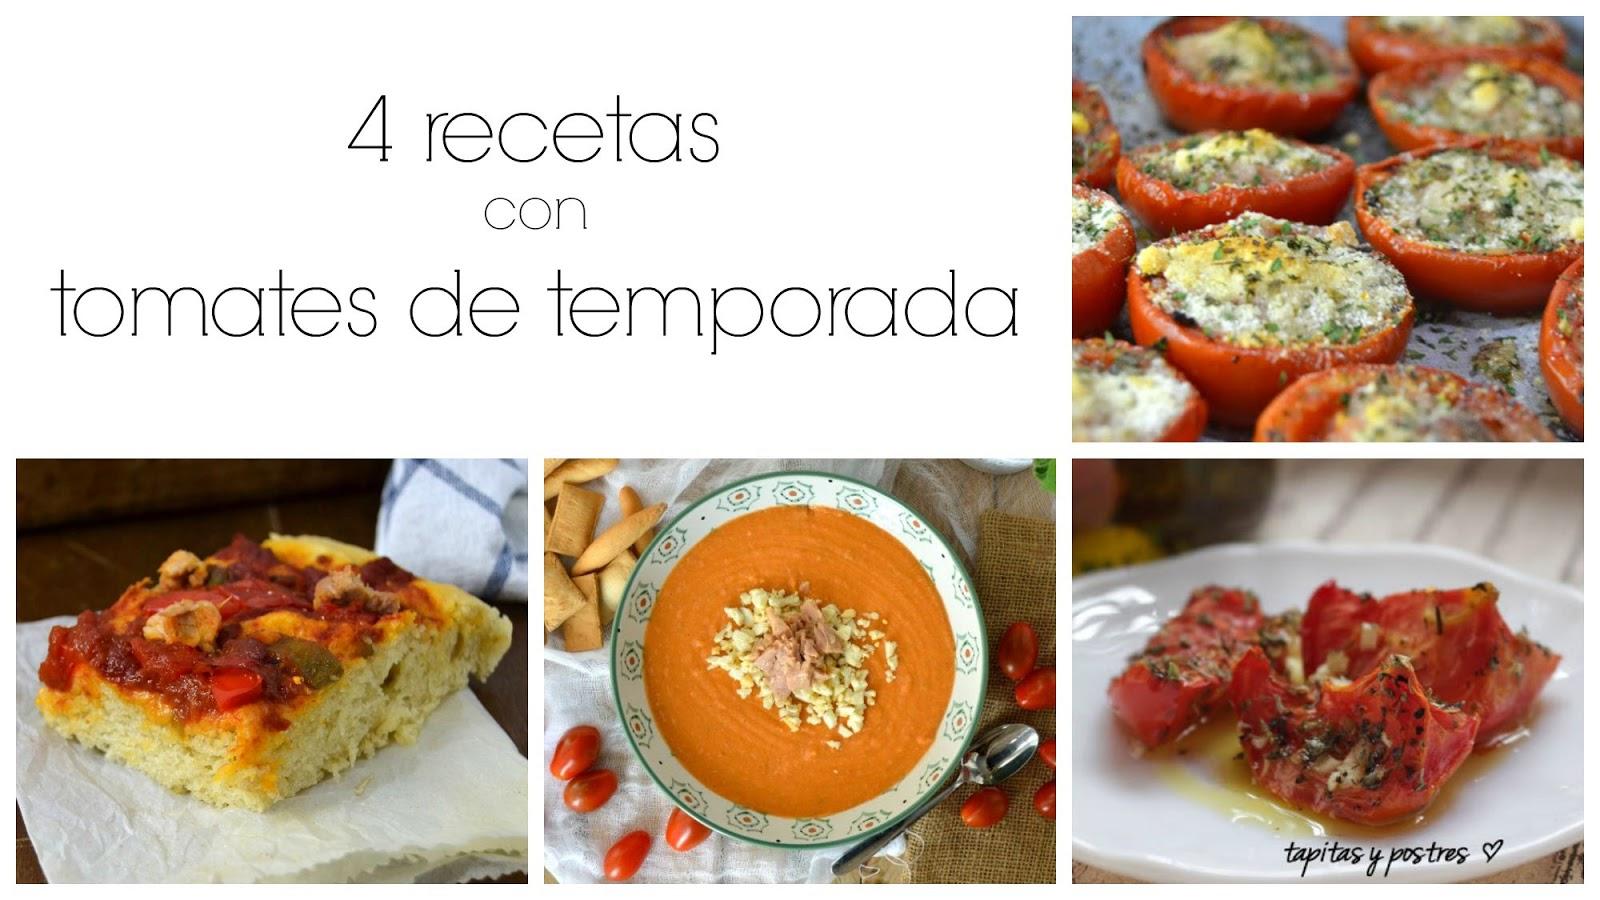 Recetas con tomates maduros